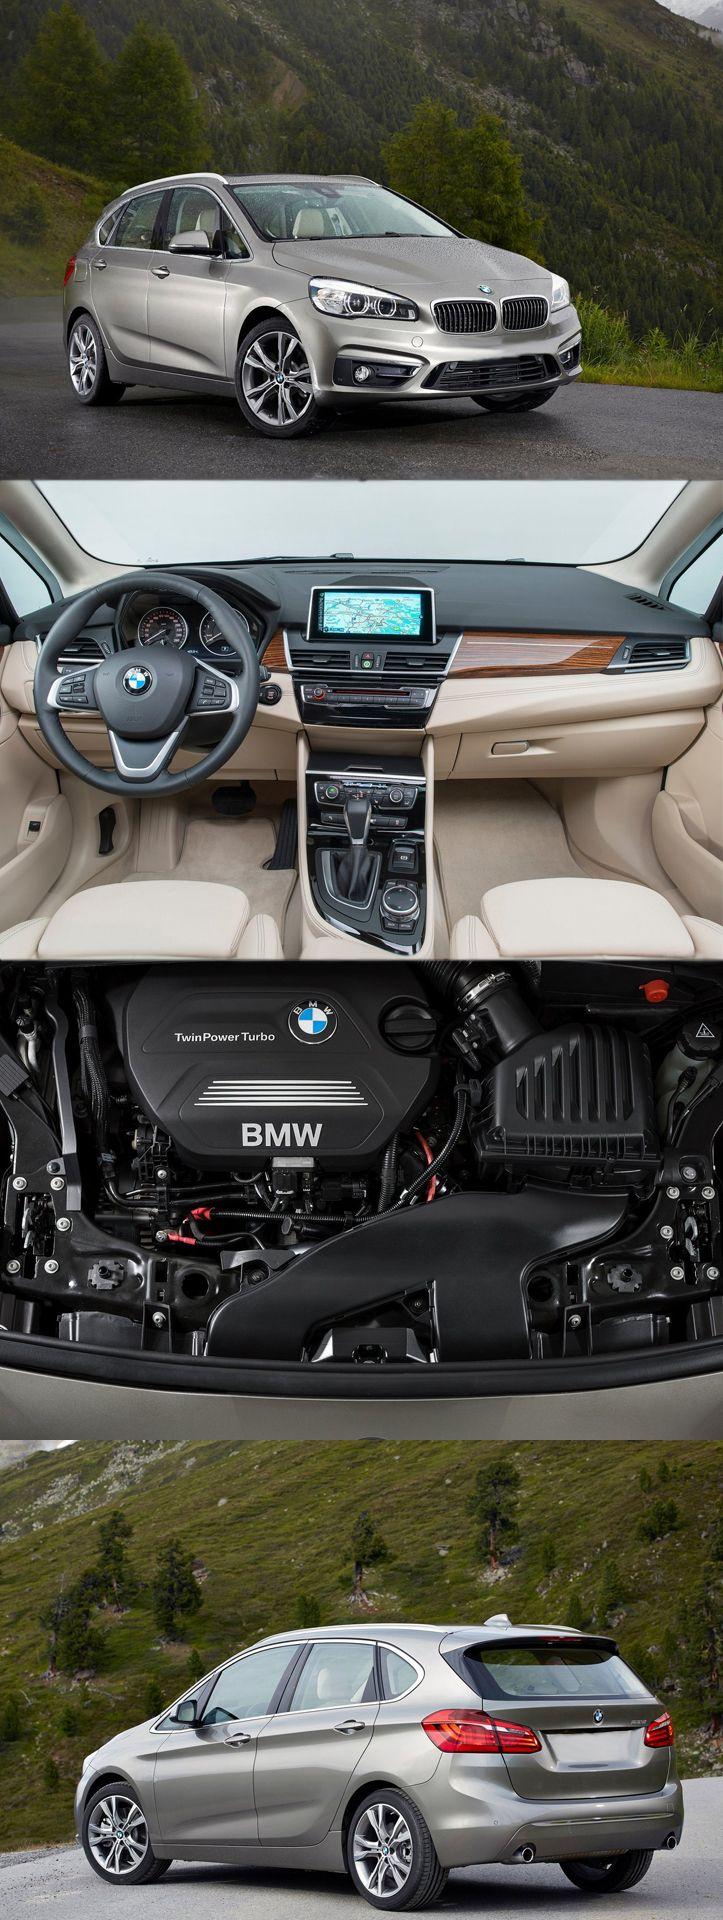 Why you should buy #BMW 218i Active Tourer Engine? #2_Series #Active_Tourer